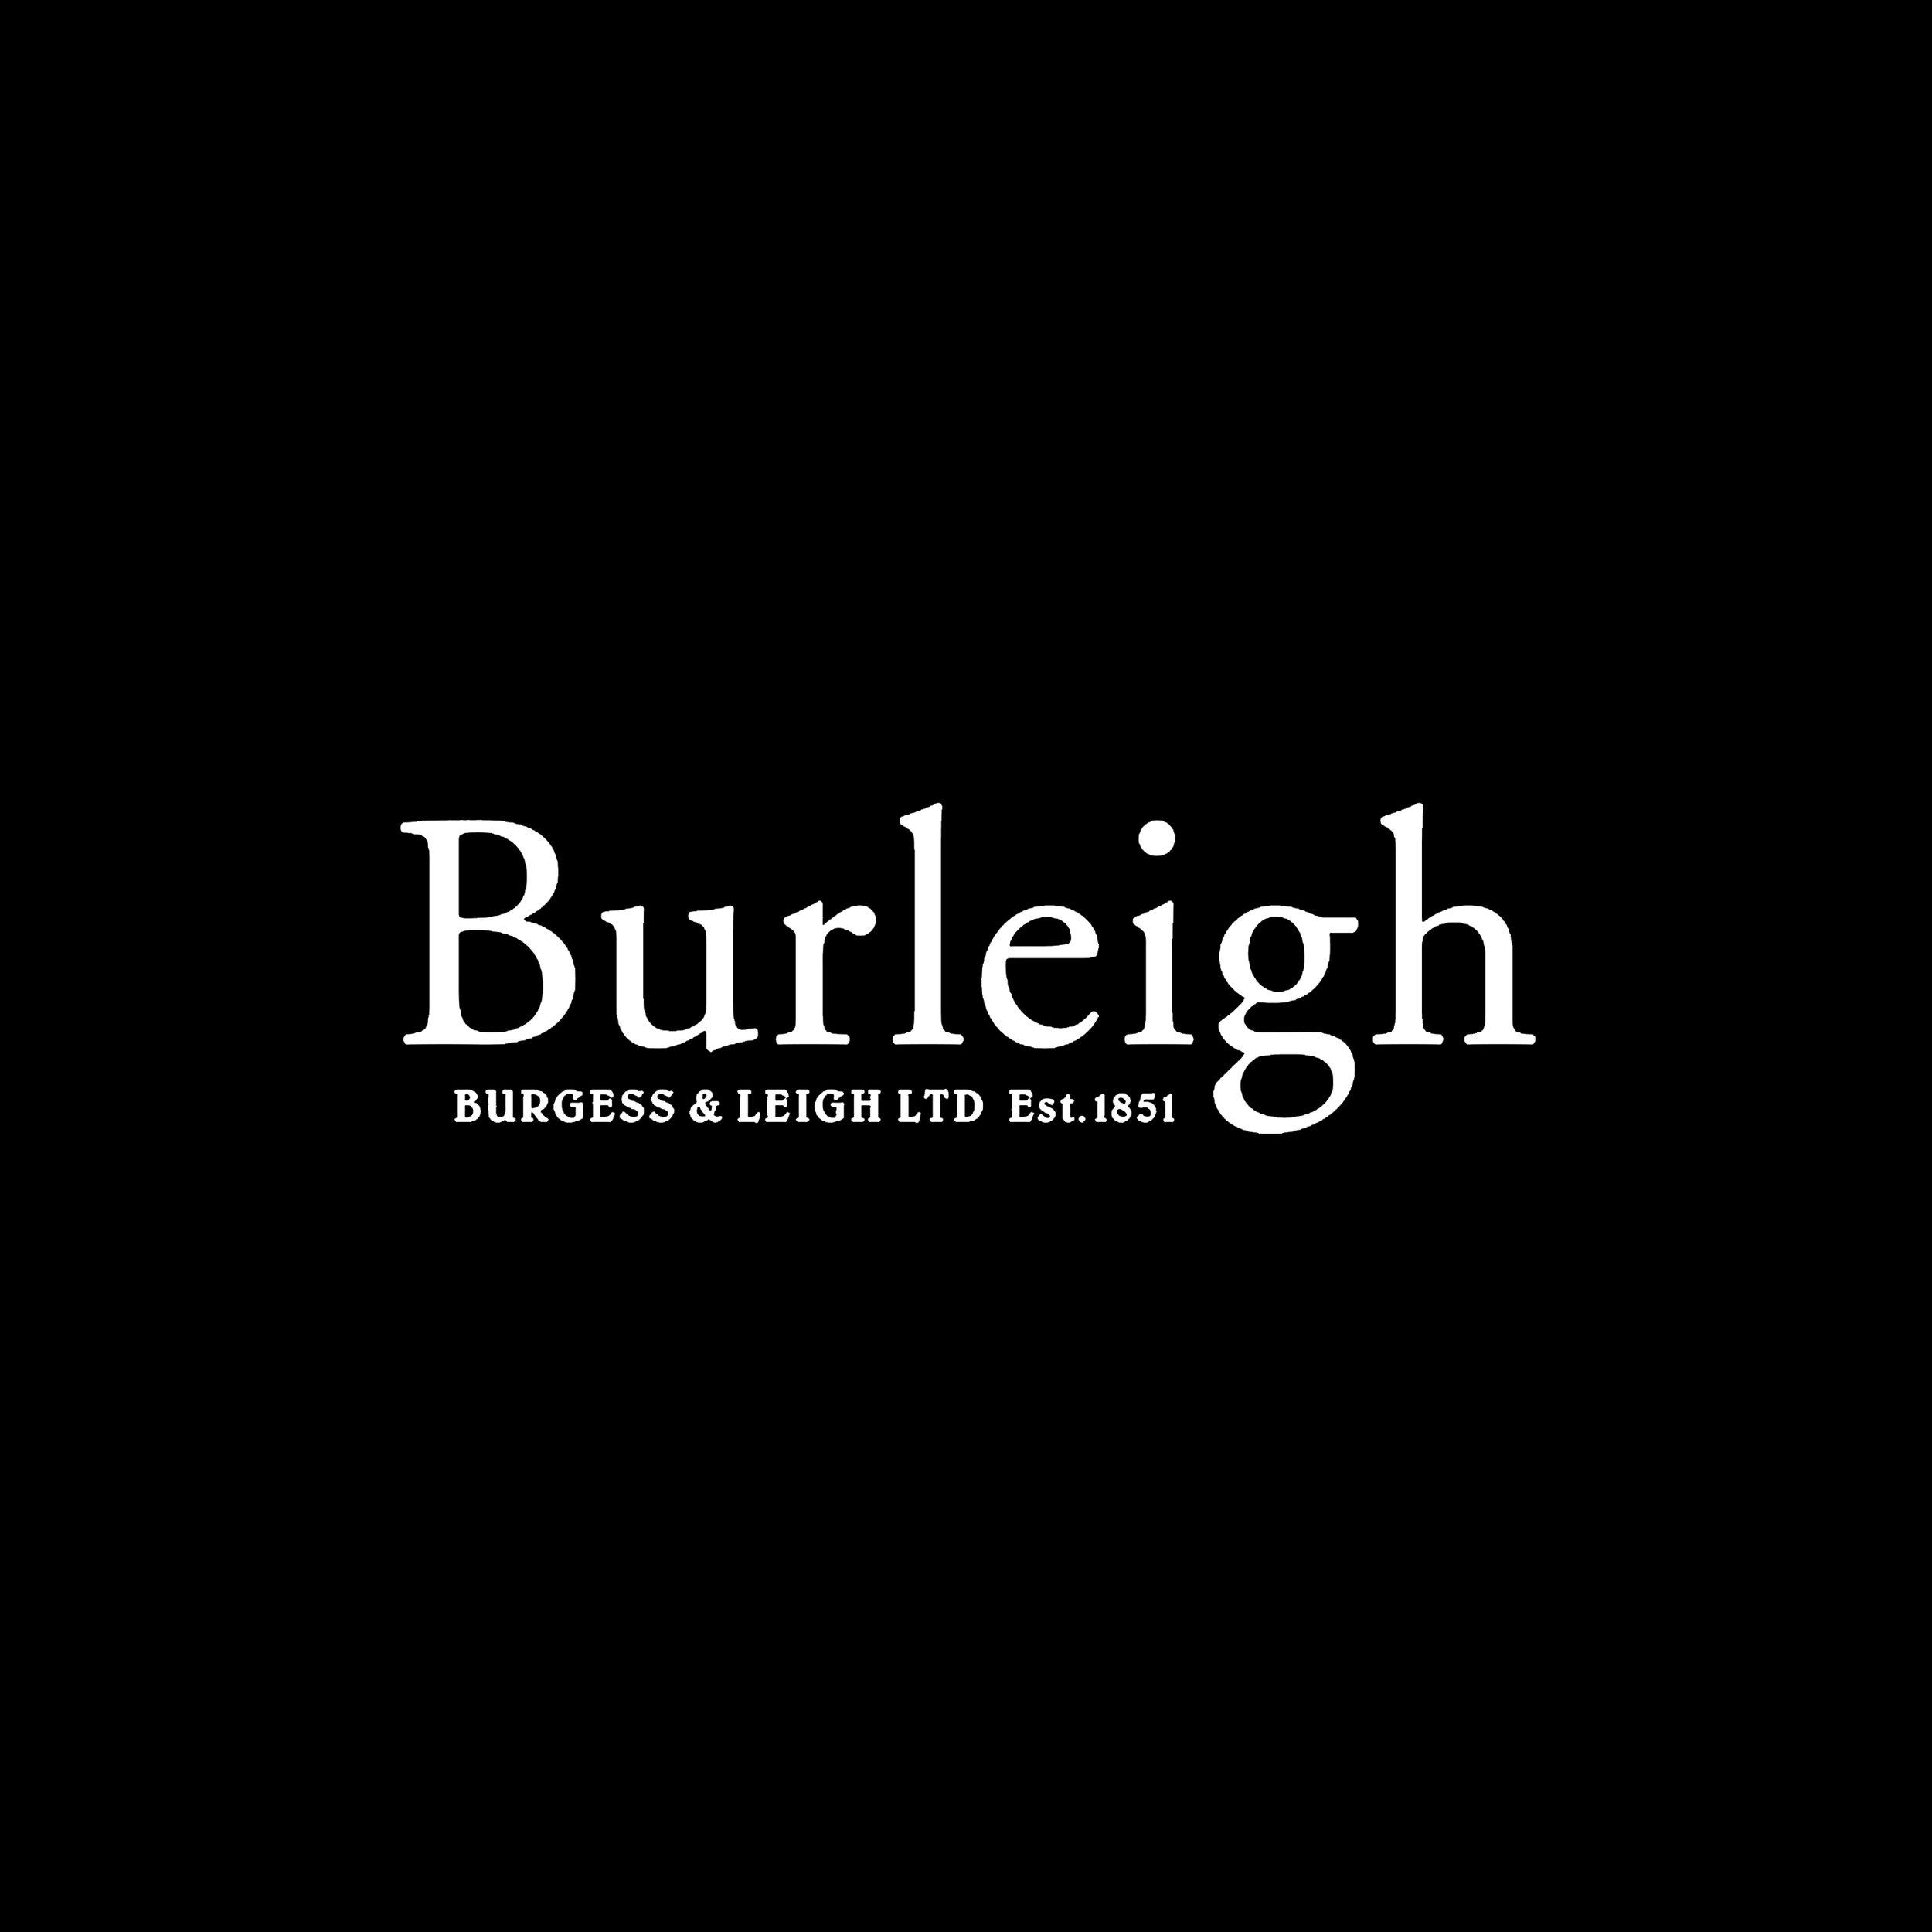 Burleigh.jpg